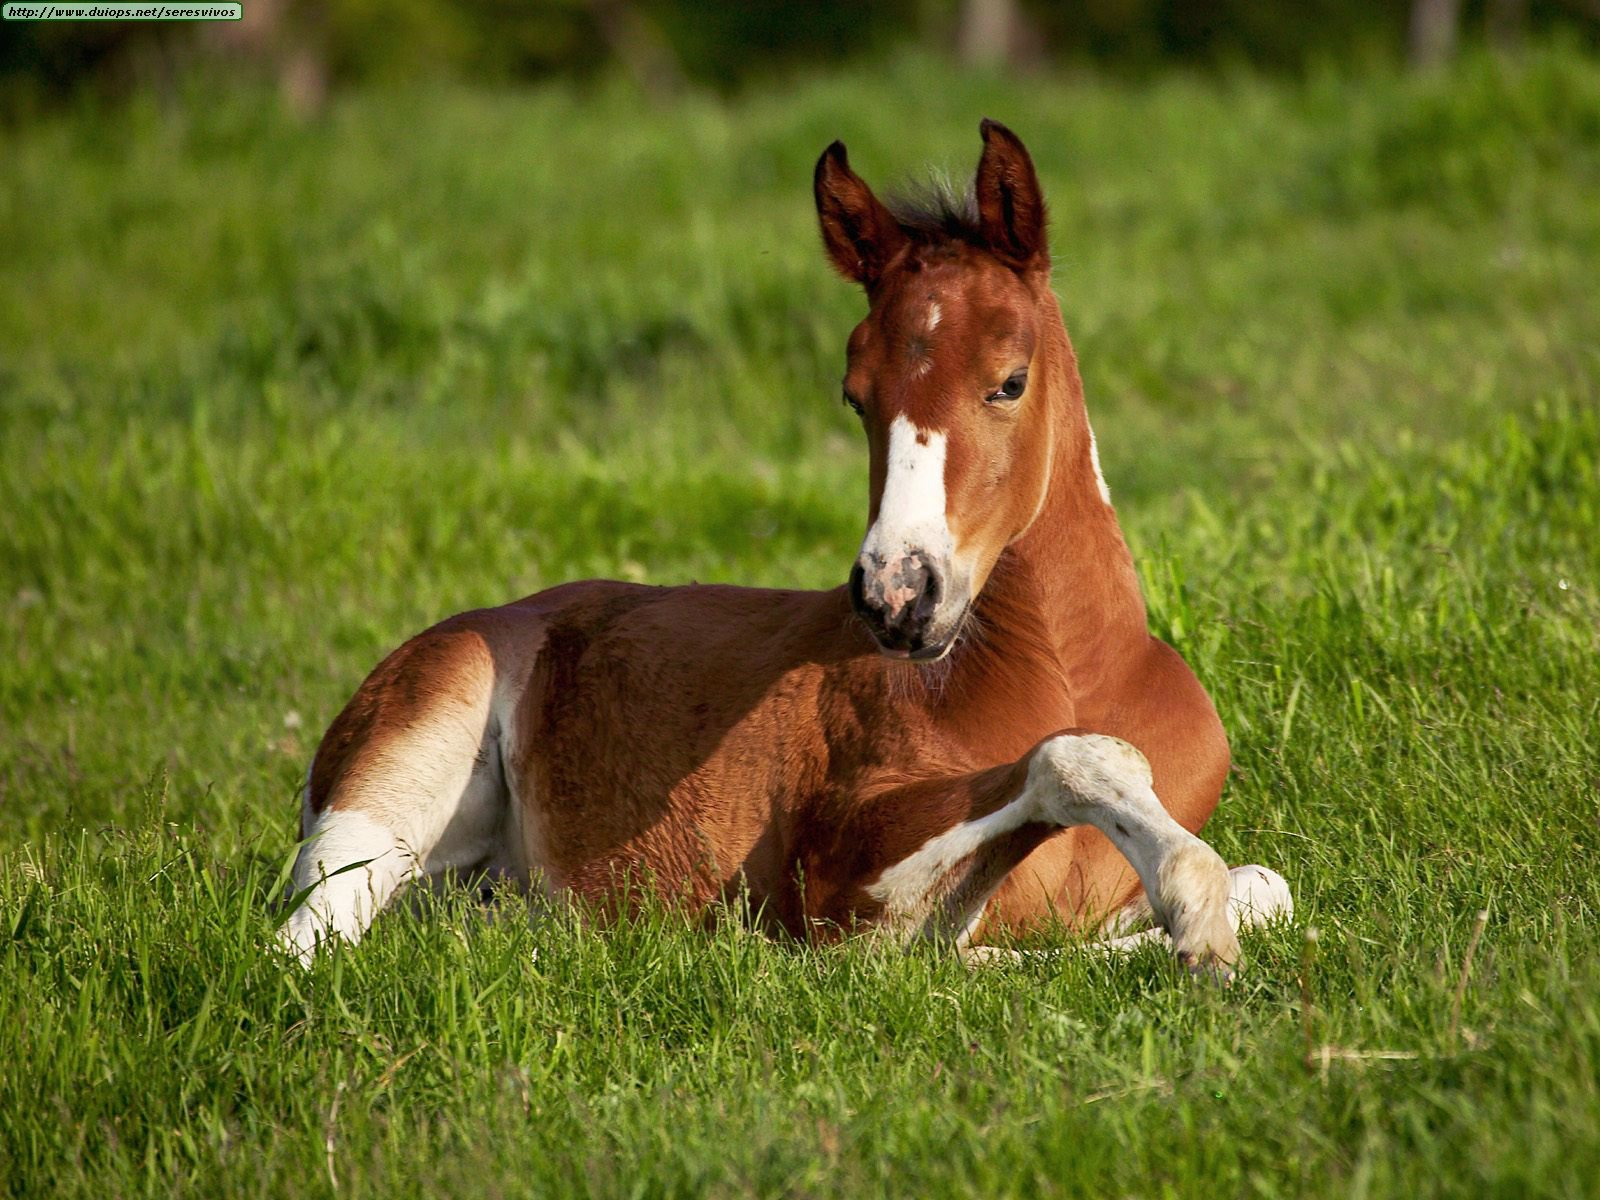 http://www.duiops.net/seresvivos/galeria/caballos/American%20Paint%20Foal,%20Iowa.jpg